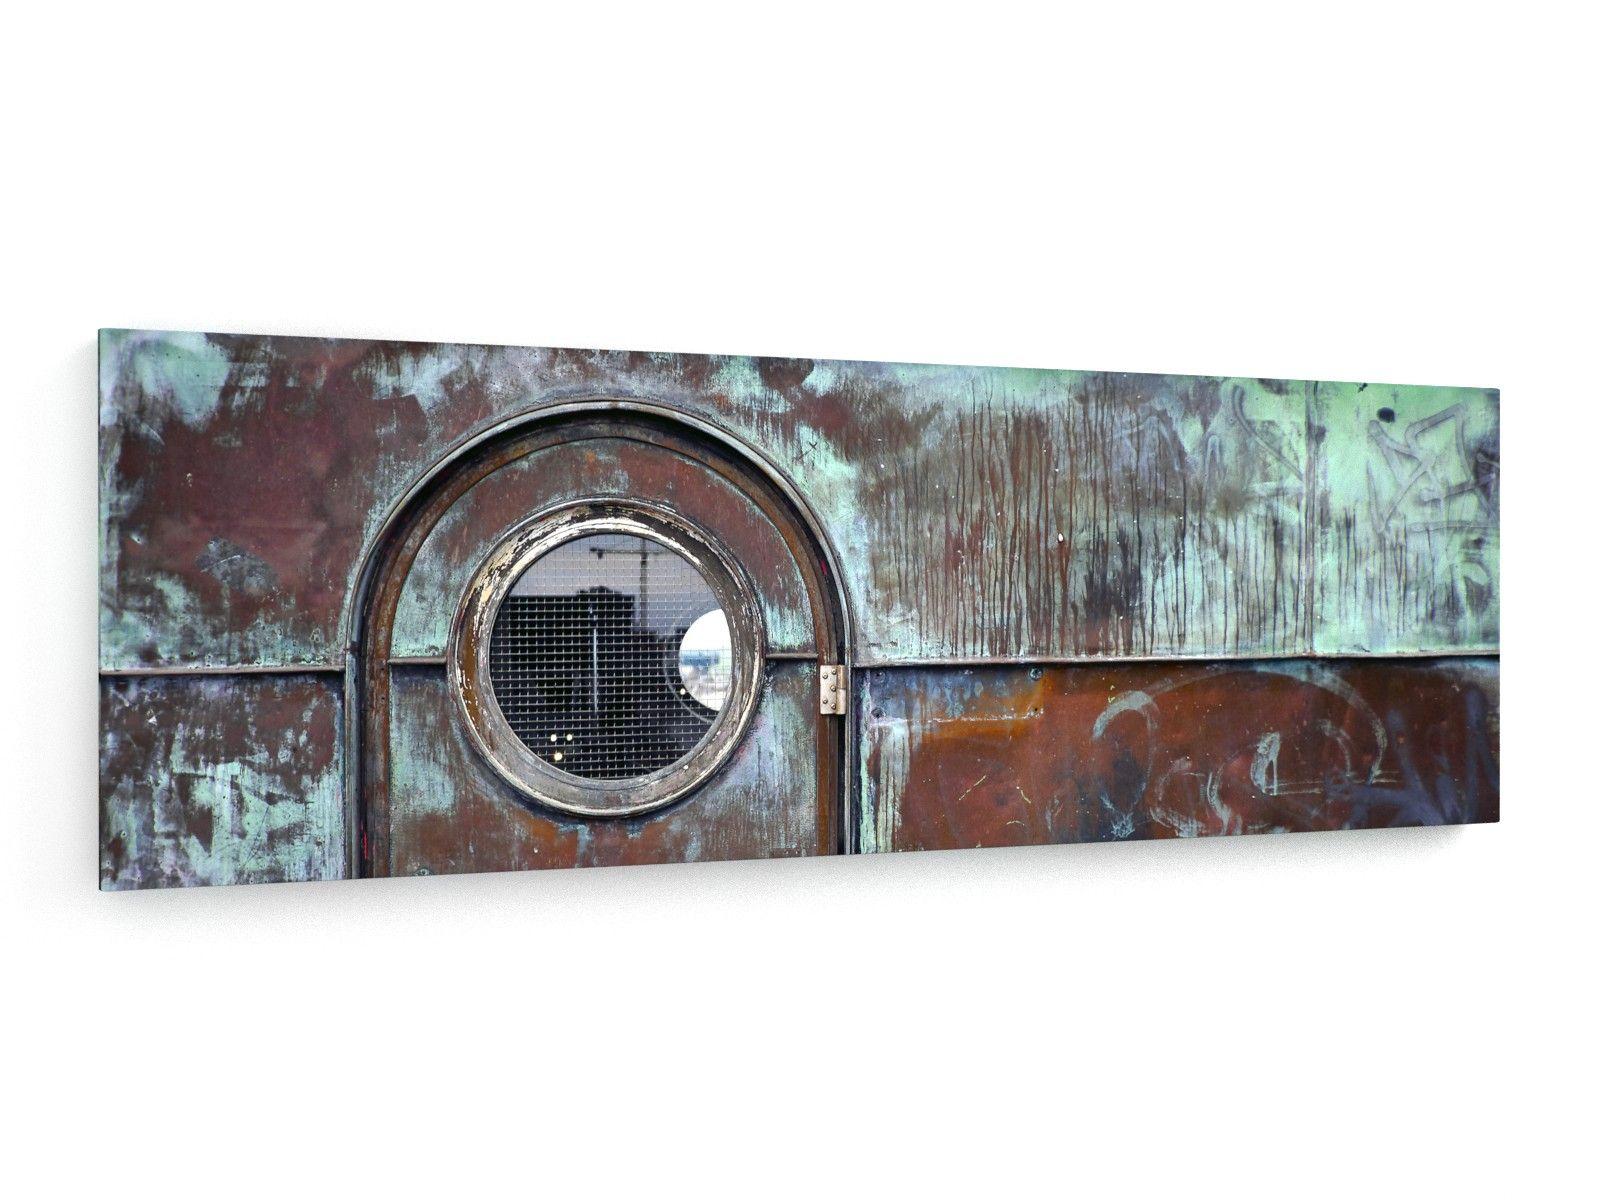 Copenhagen-Porthole #Gordon #Williams #weewado #Copenhagen #Denmark #porthole #house